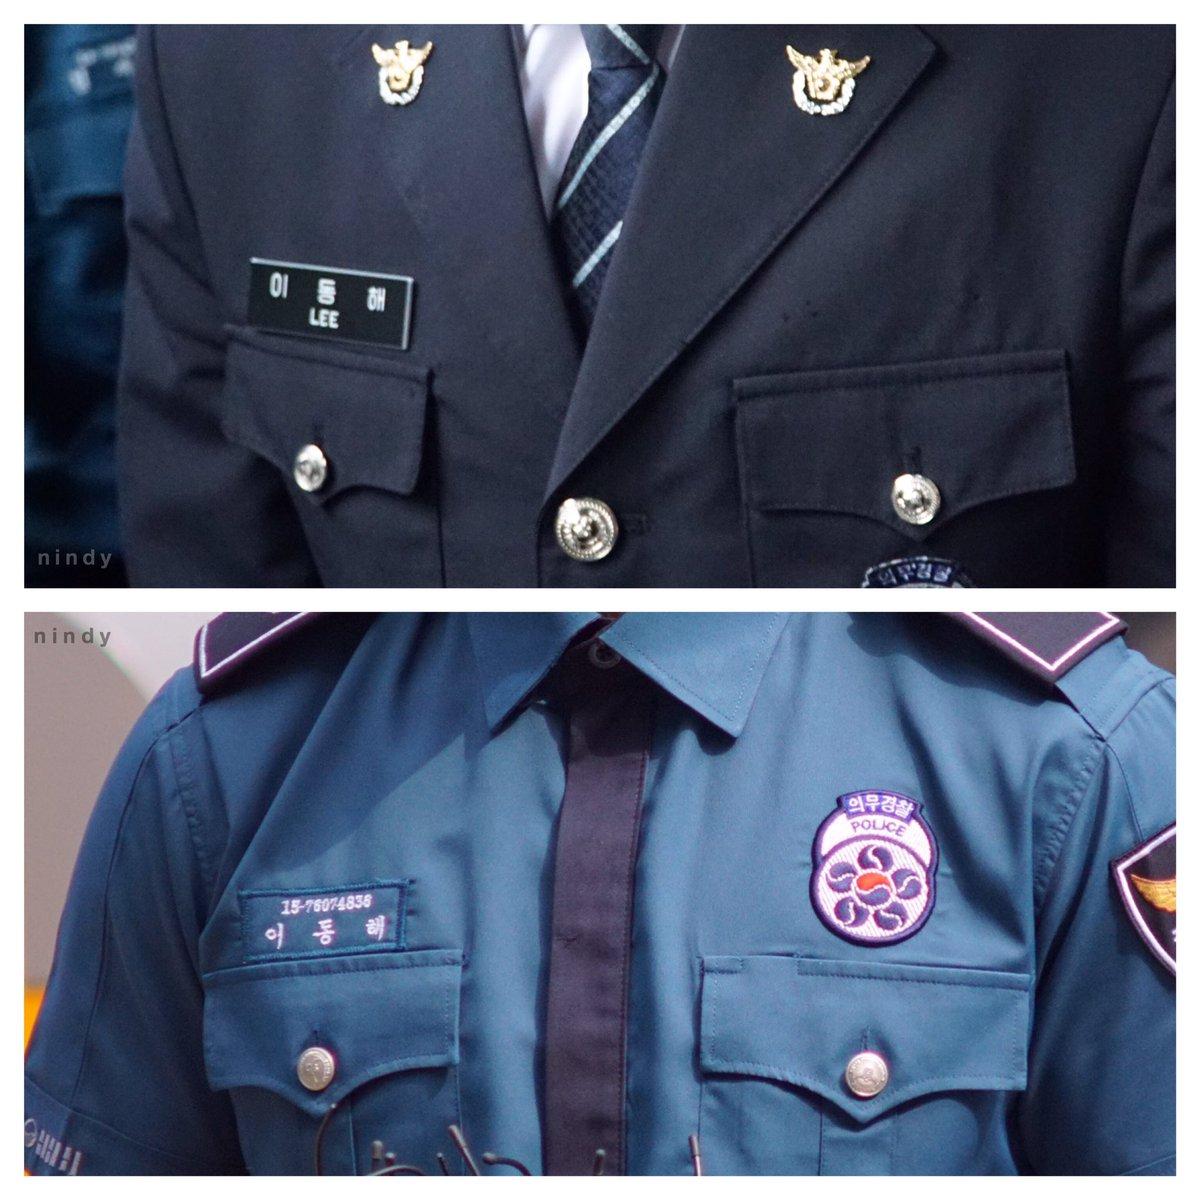 Goodbye, uniforms. #donghae #leedonghae #superjunior #이동해 #동해 #슈퍼주니어 #WelcomBackDonghae <br>http://pic.twitter.com/dgxX2Zt0Vp